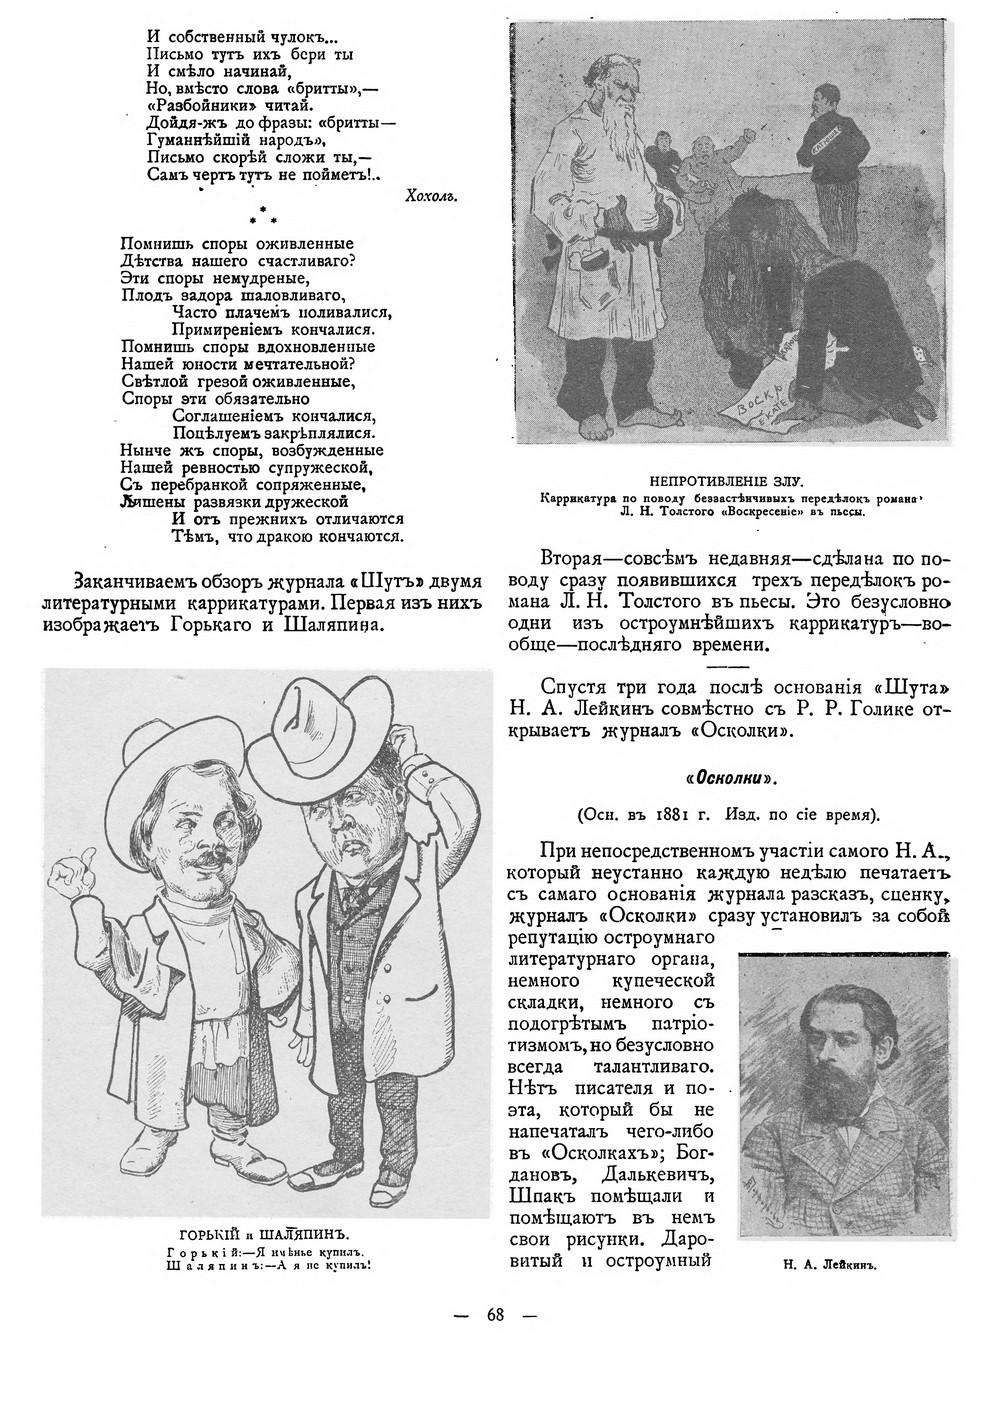 http://i1.imageban.ru/out/2014/01/06/6a5f317d49938318c411a40501c8263f.jpg